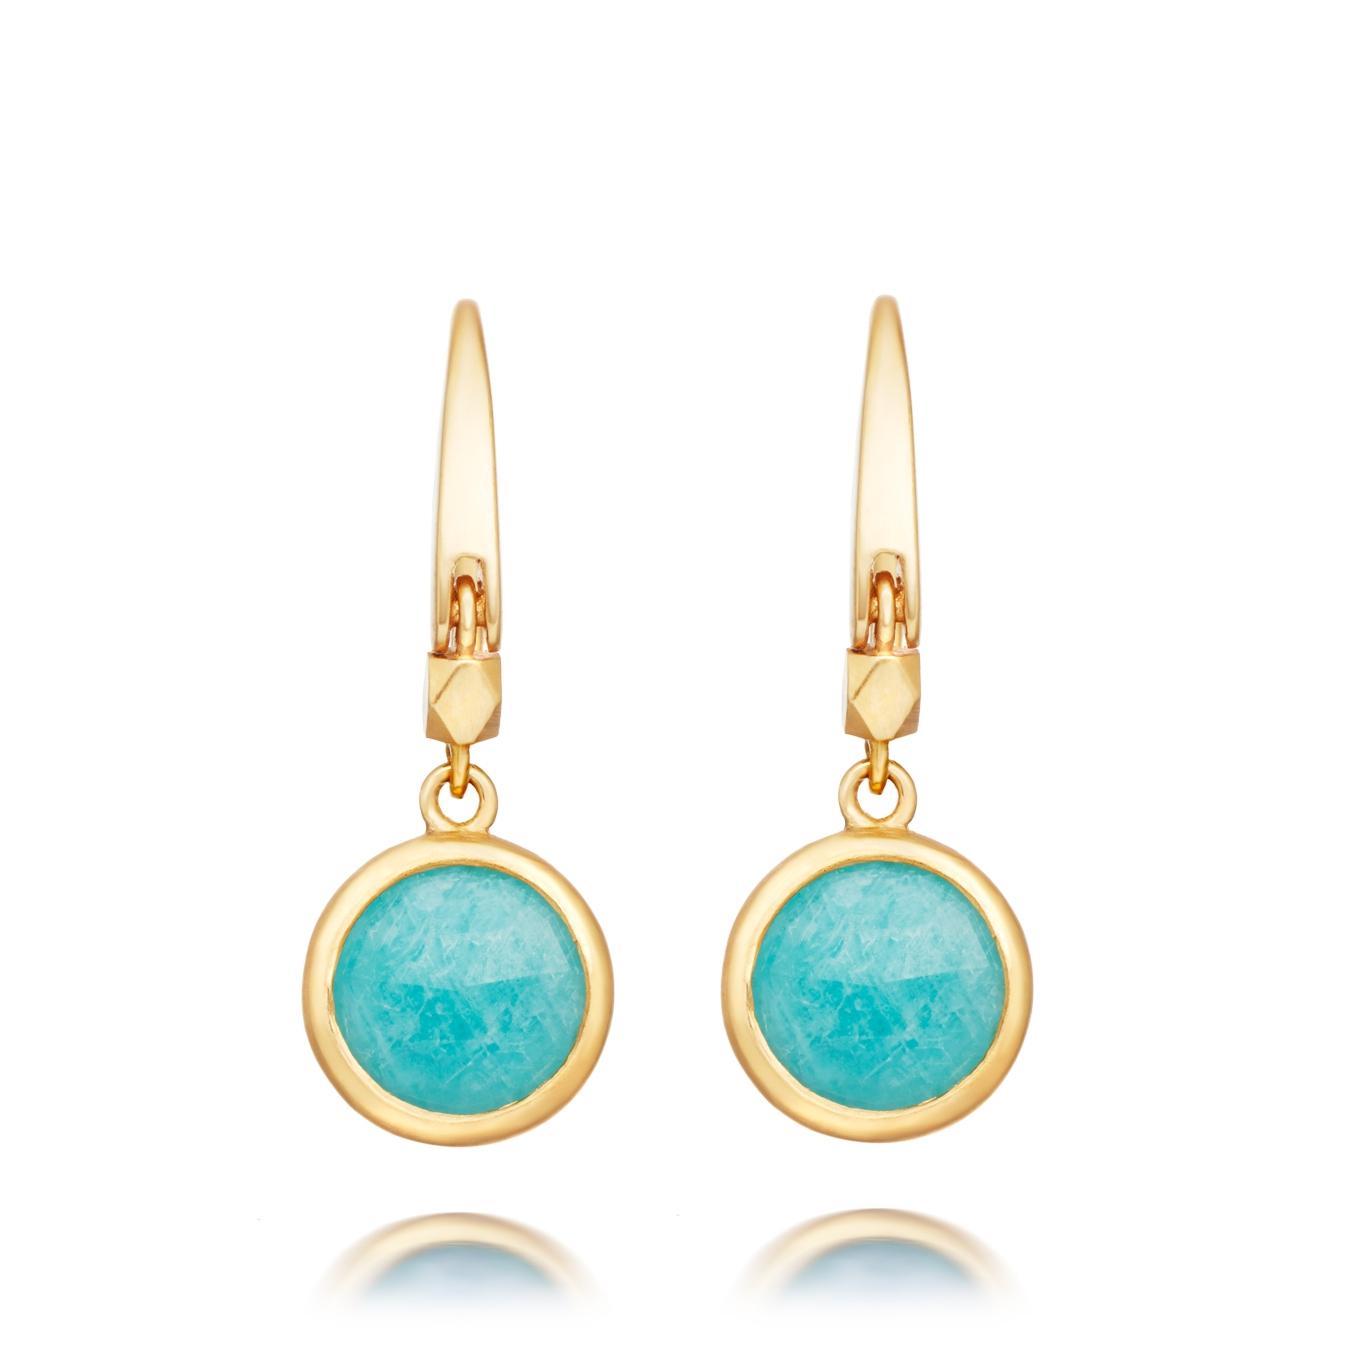 Mini Amazonite Round Stilla Drop Earrings